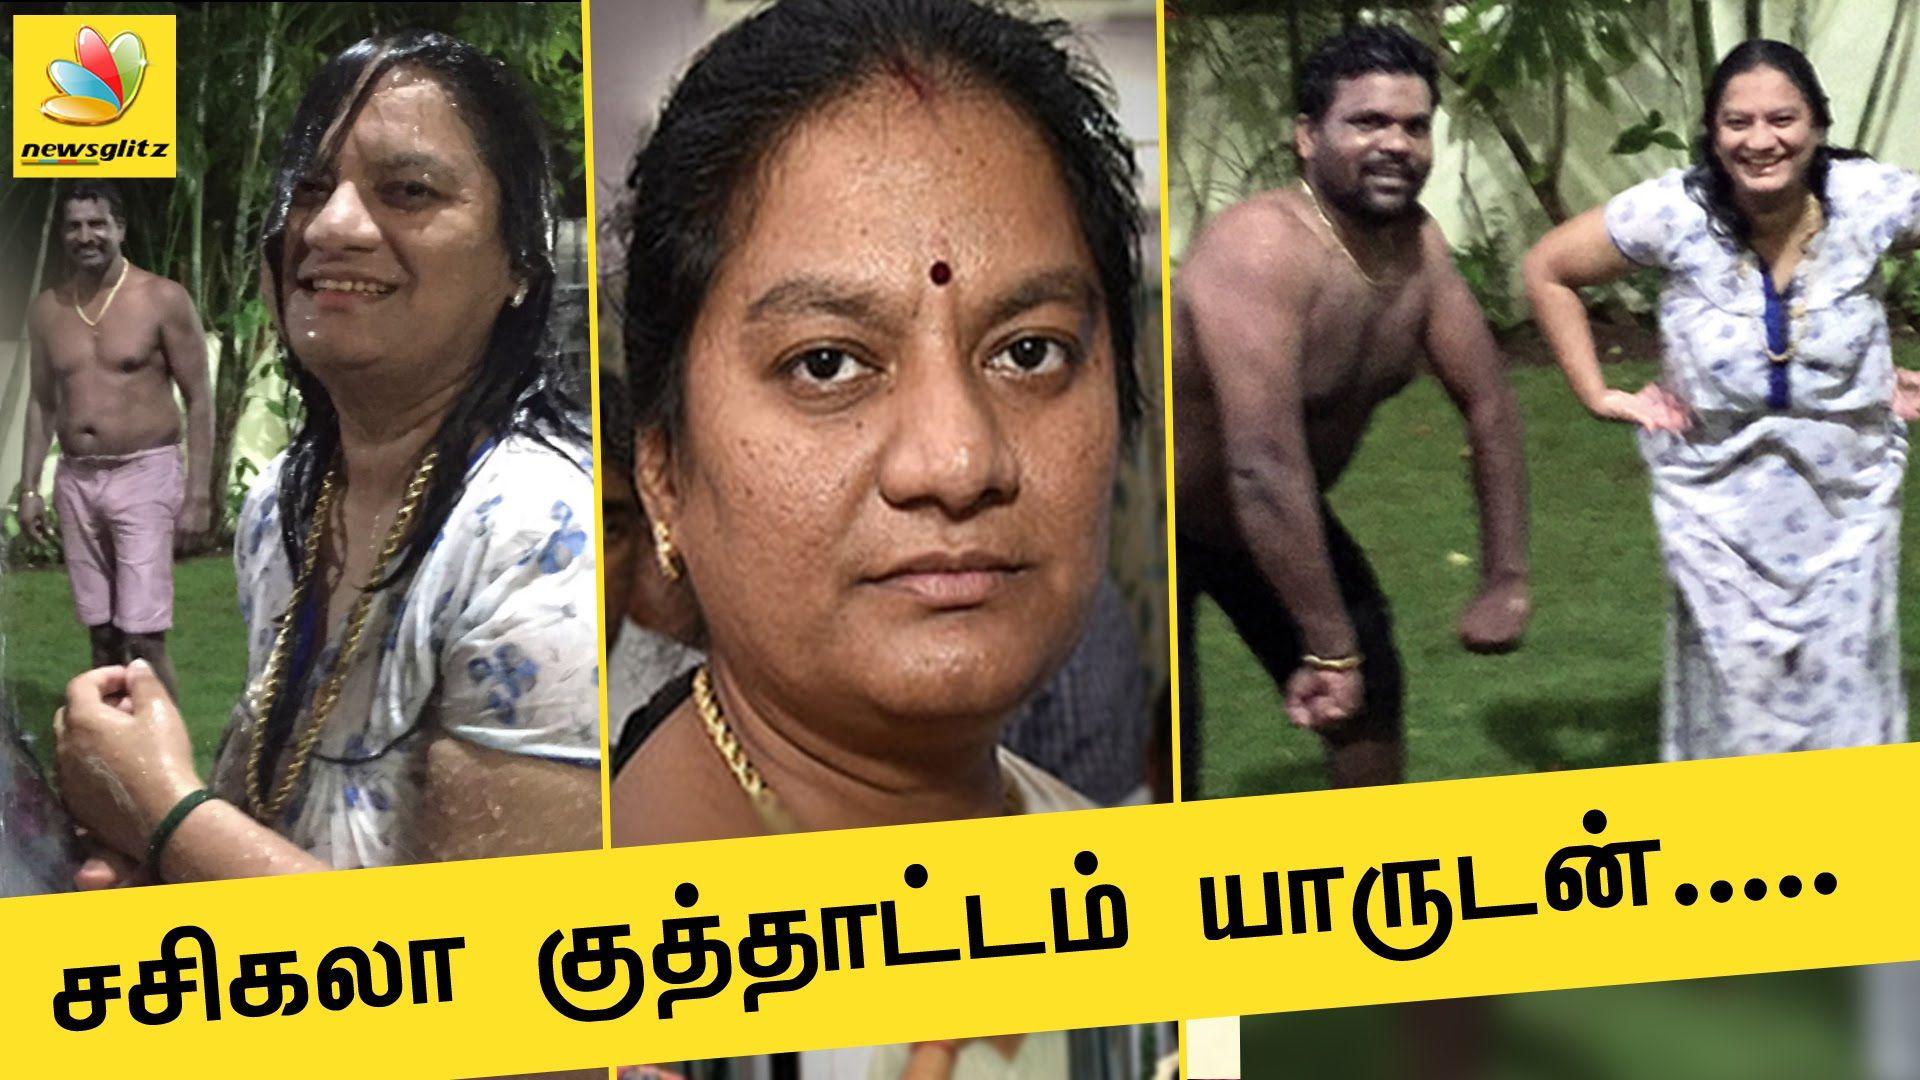 Cool mp sasikala pushpa with bilal is trending in social media cool mp sasikala pushpa with bilal is trending in social media hot tamil news latest husband photo video altavistaventures Choice Image